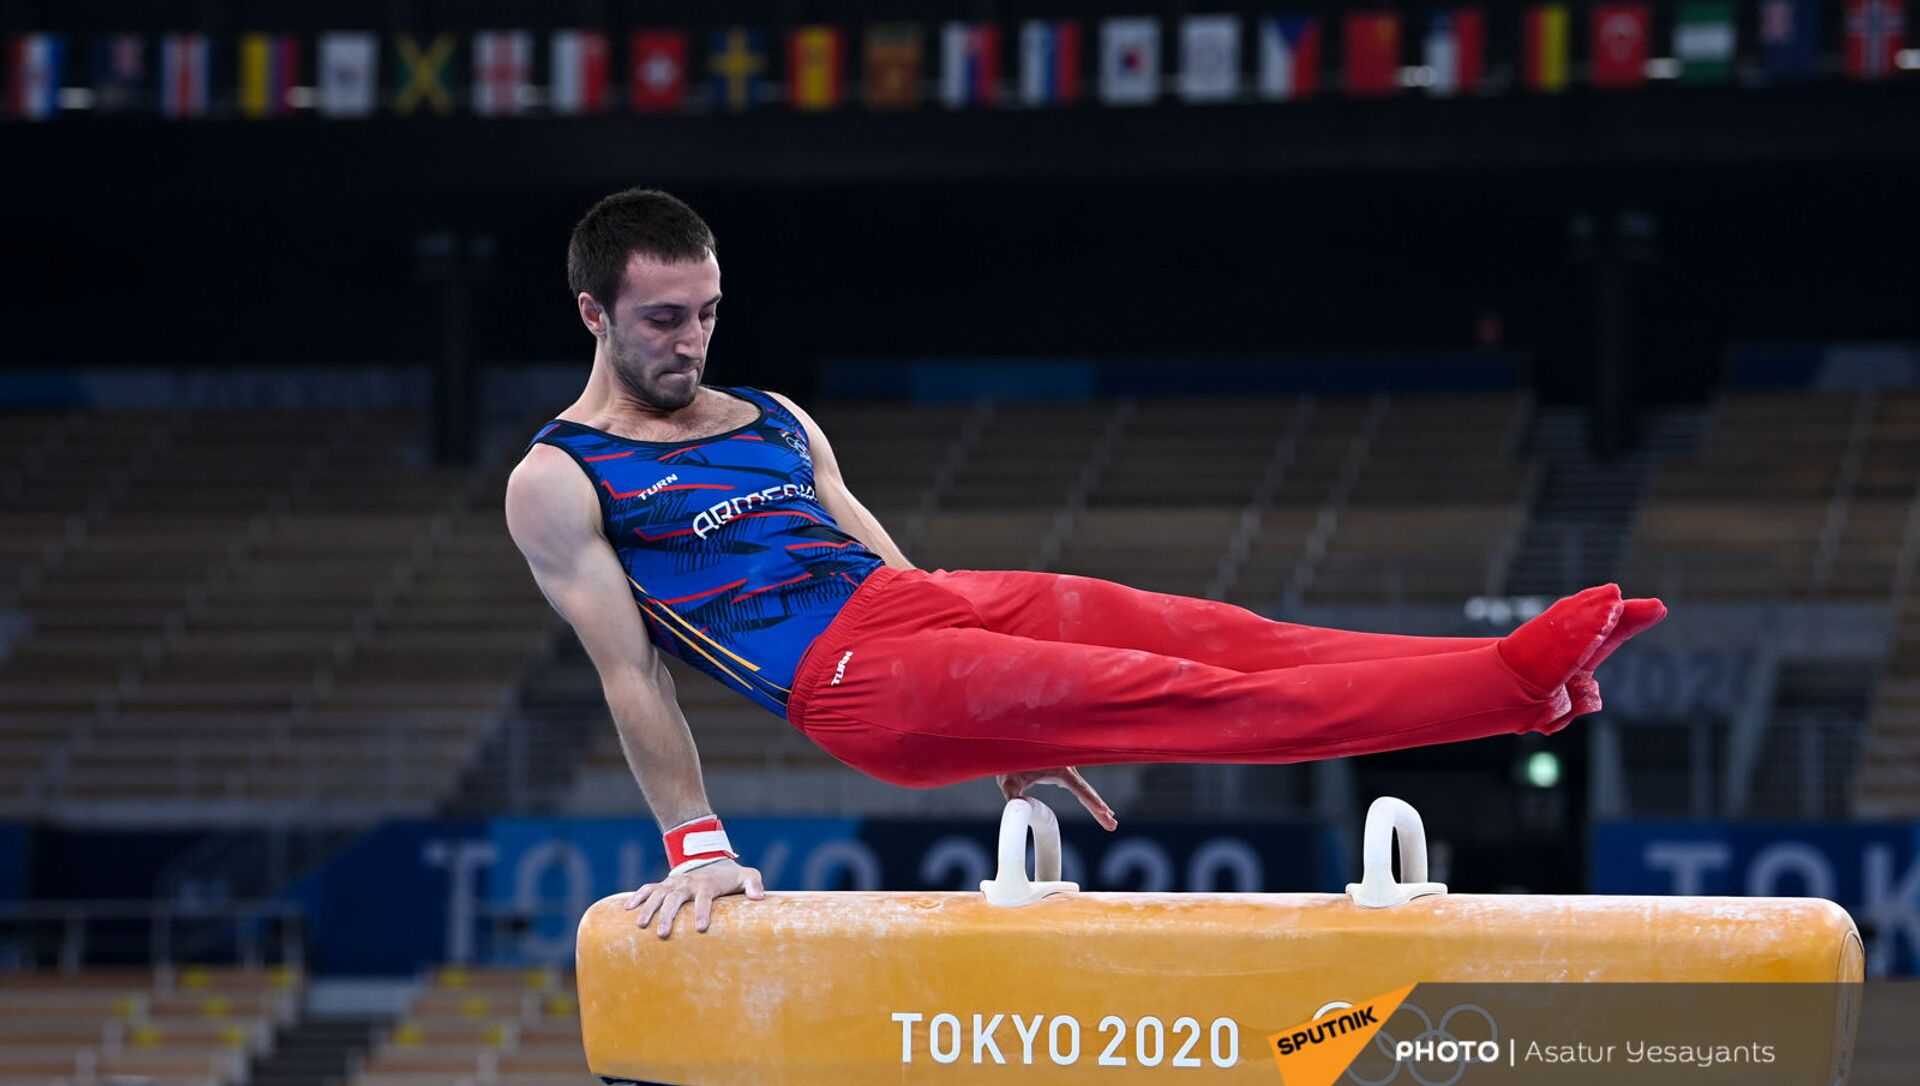 Второе выступление легкоатлета Артура Давтяна  - Sputnik Արմենիա, 1920, 24.07.2021